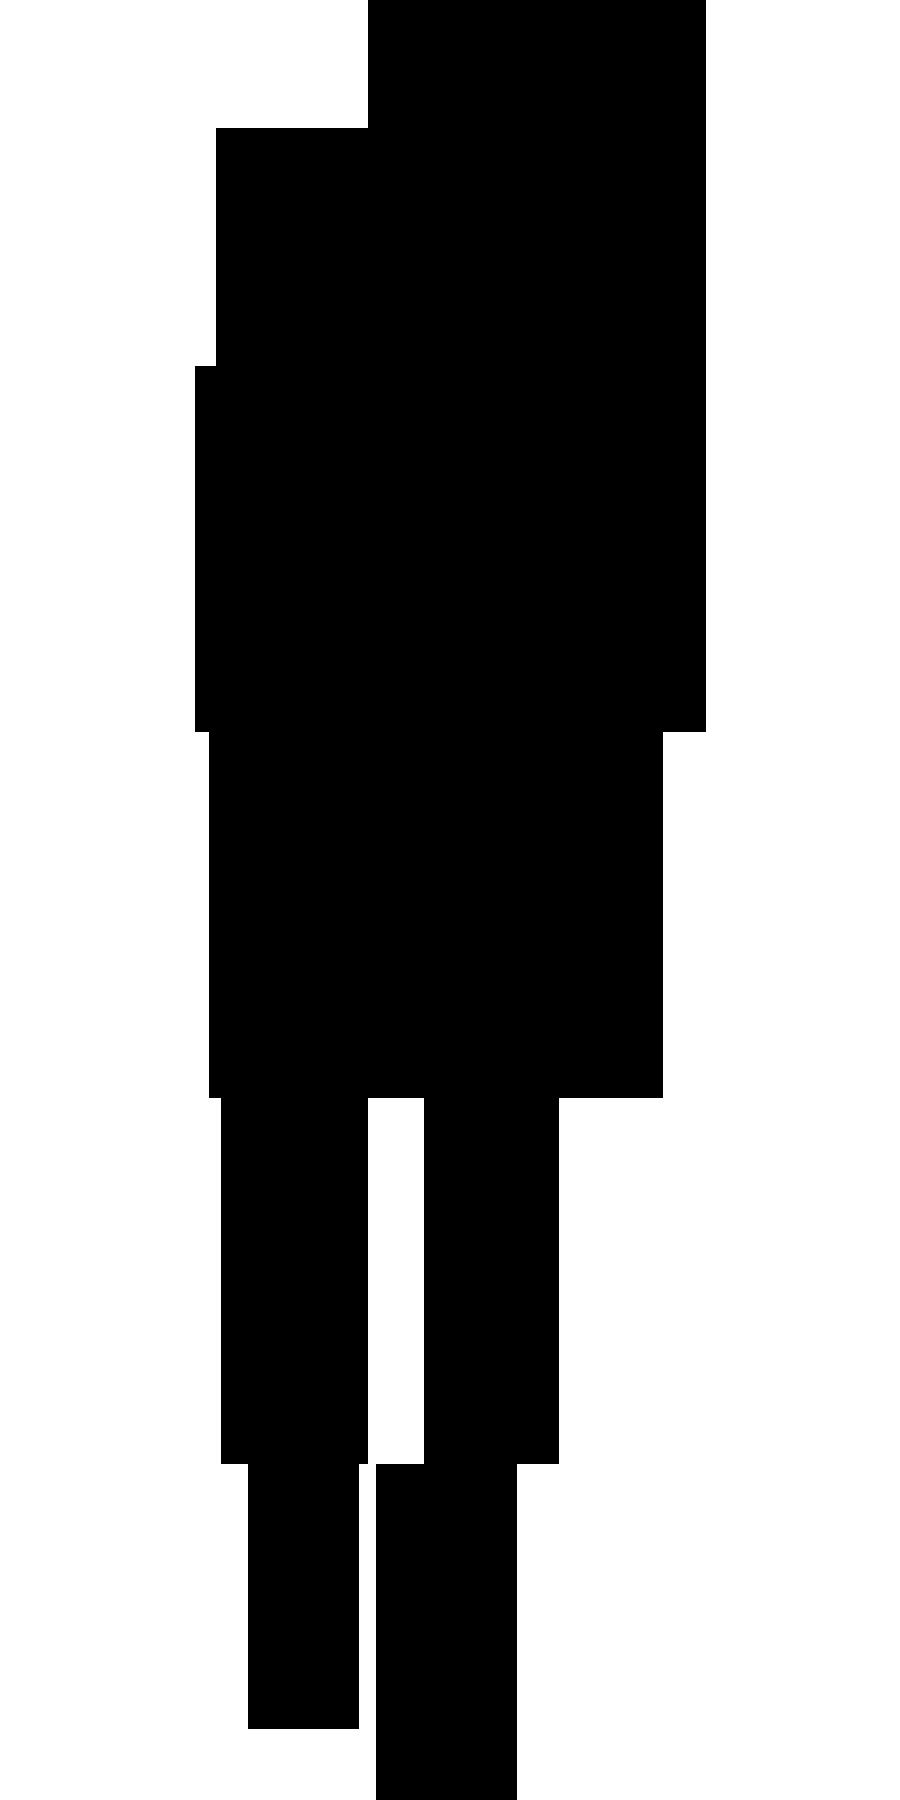 900x1800 Silhouette Clipart Photographer